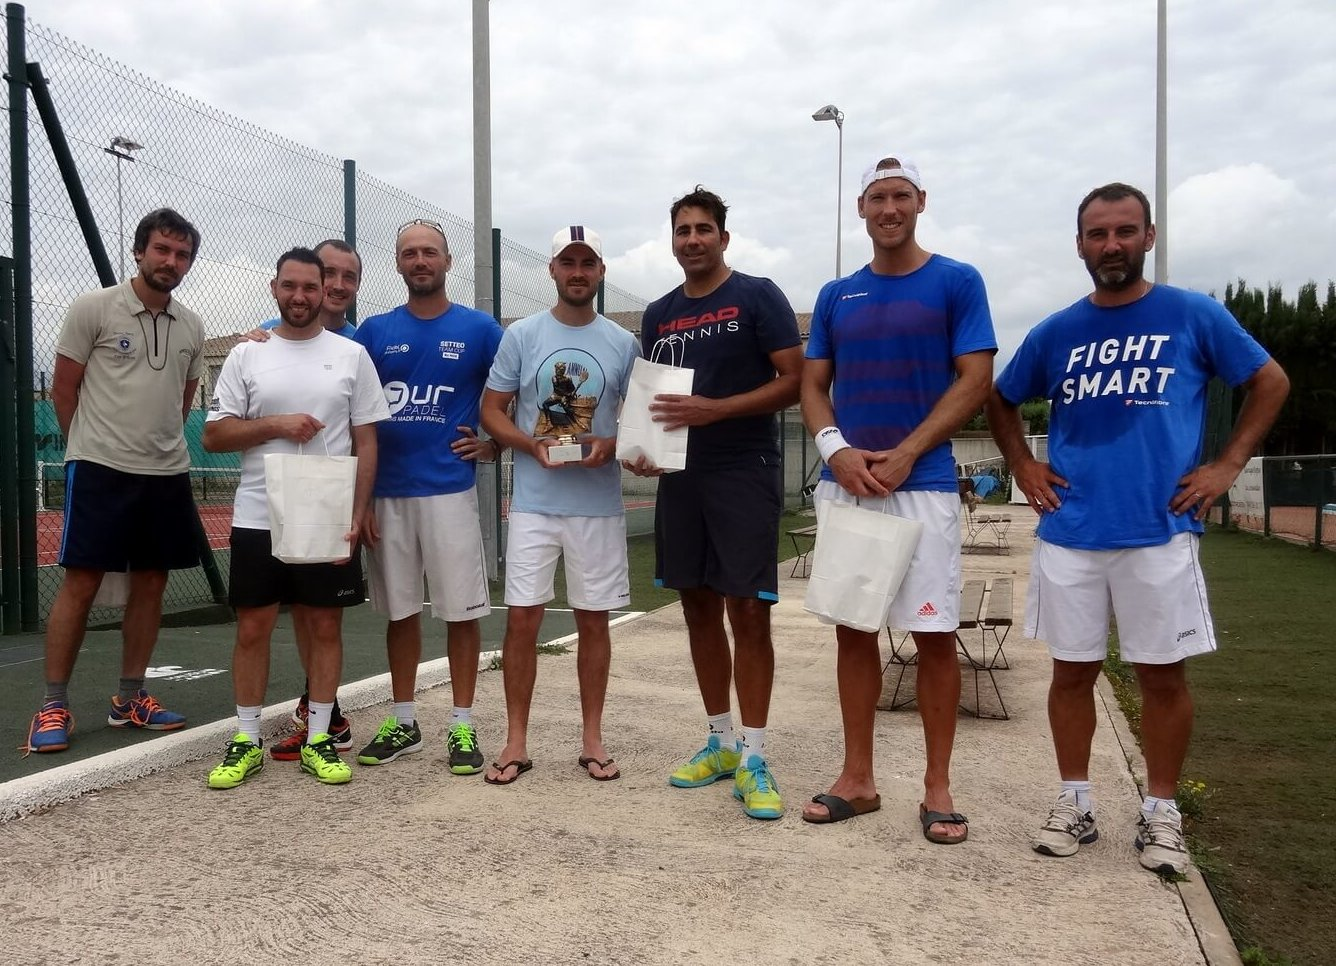 DADOIT / LAUGHLIN vince il Melgorian Open Raquette